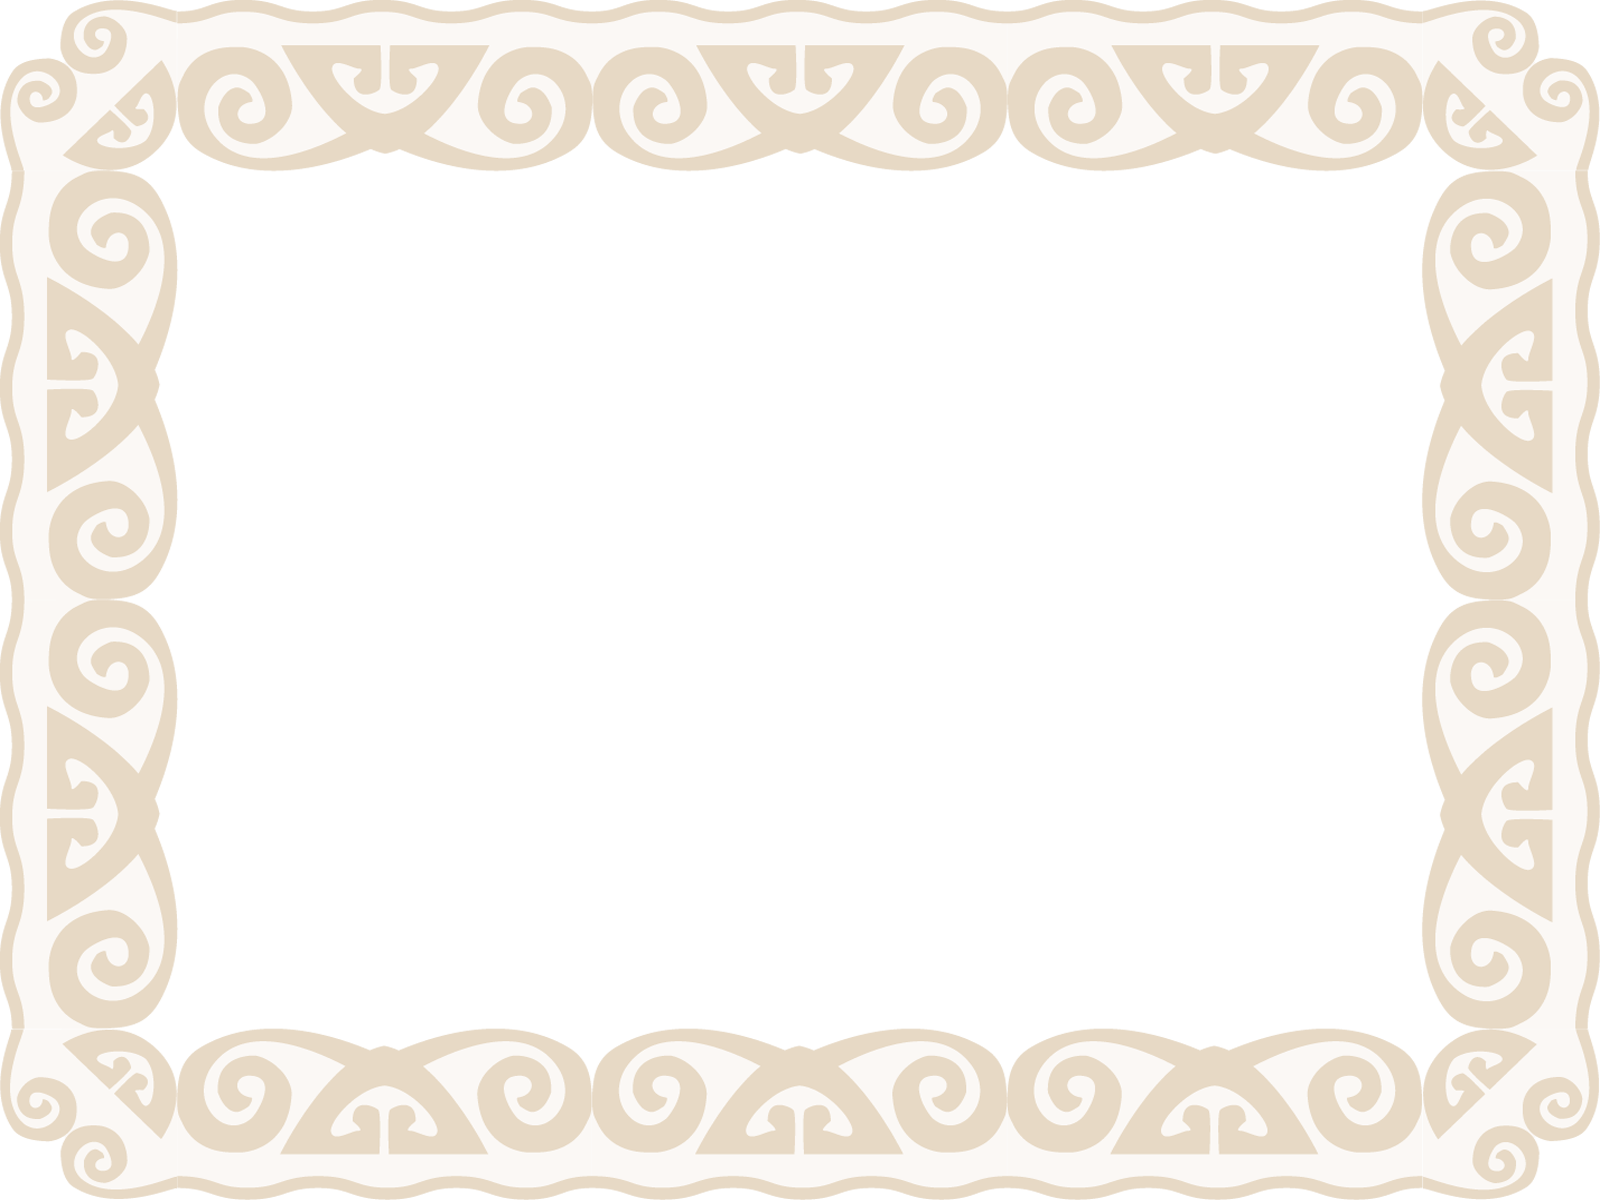 greek brown classic frame | marcos y bordes | Pinterest | Marcos